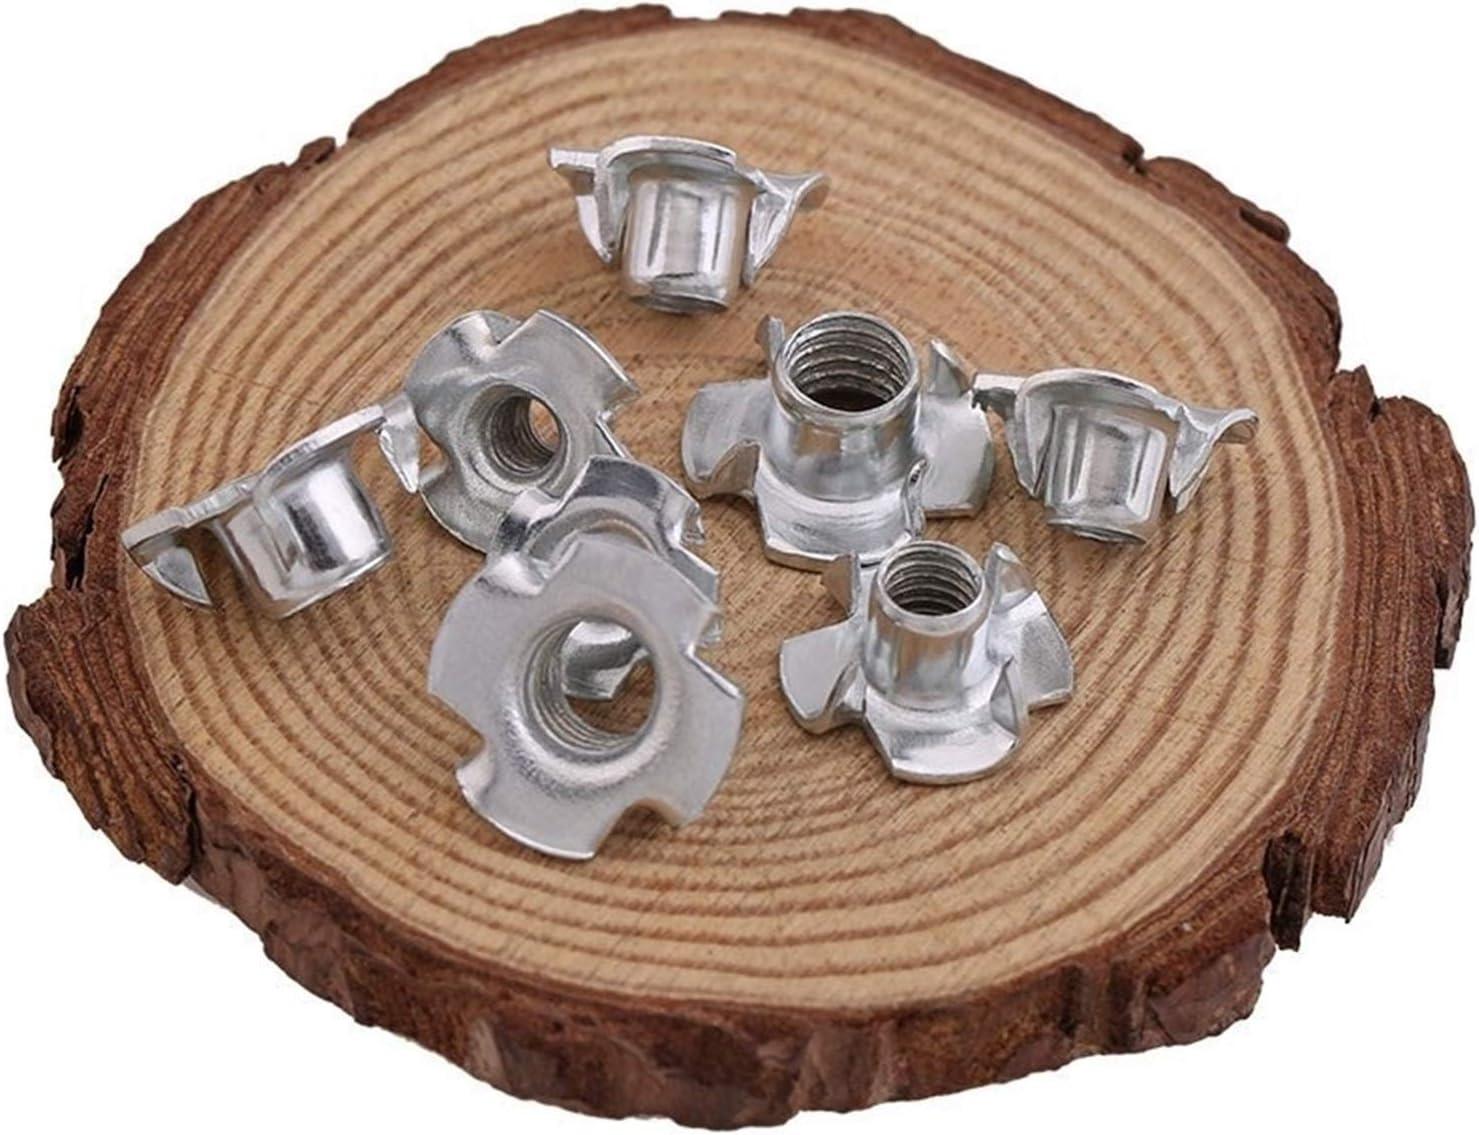 YBDZ 80pcs M3 M4 M5 M6 M8 Zinc Plated Four Claws Nut Speaker Nut T-nut Blind Pronged Tee Nut Furniture Hardware